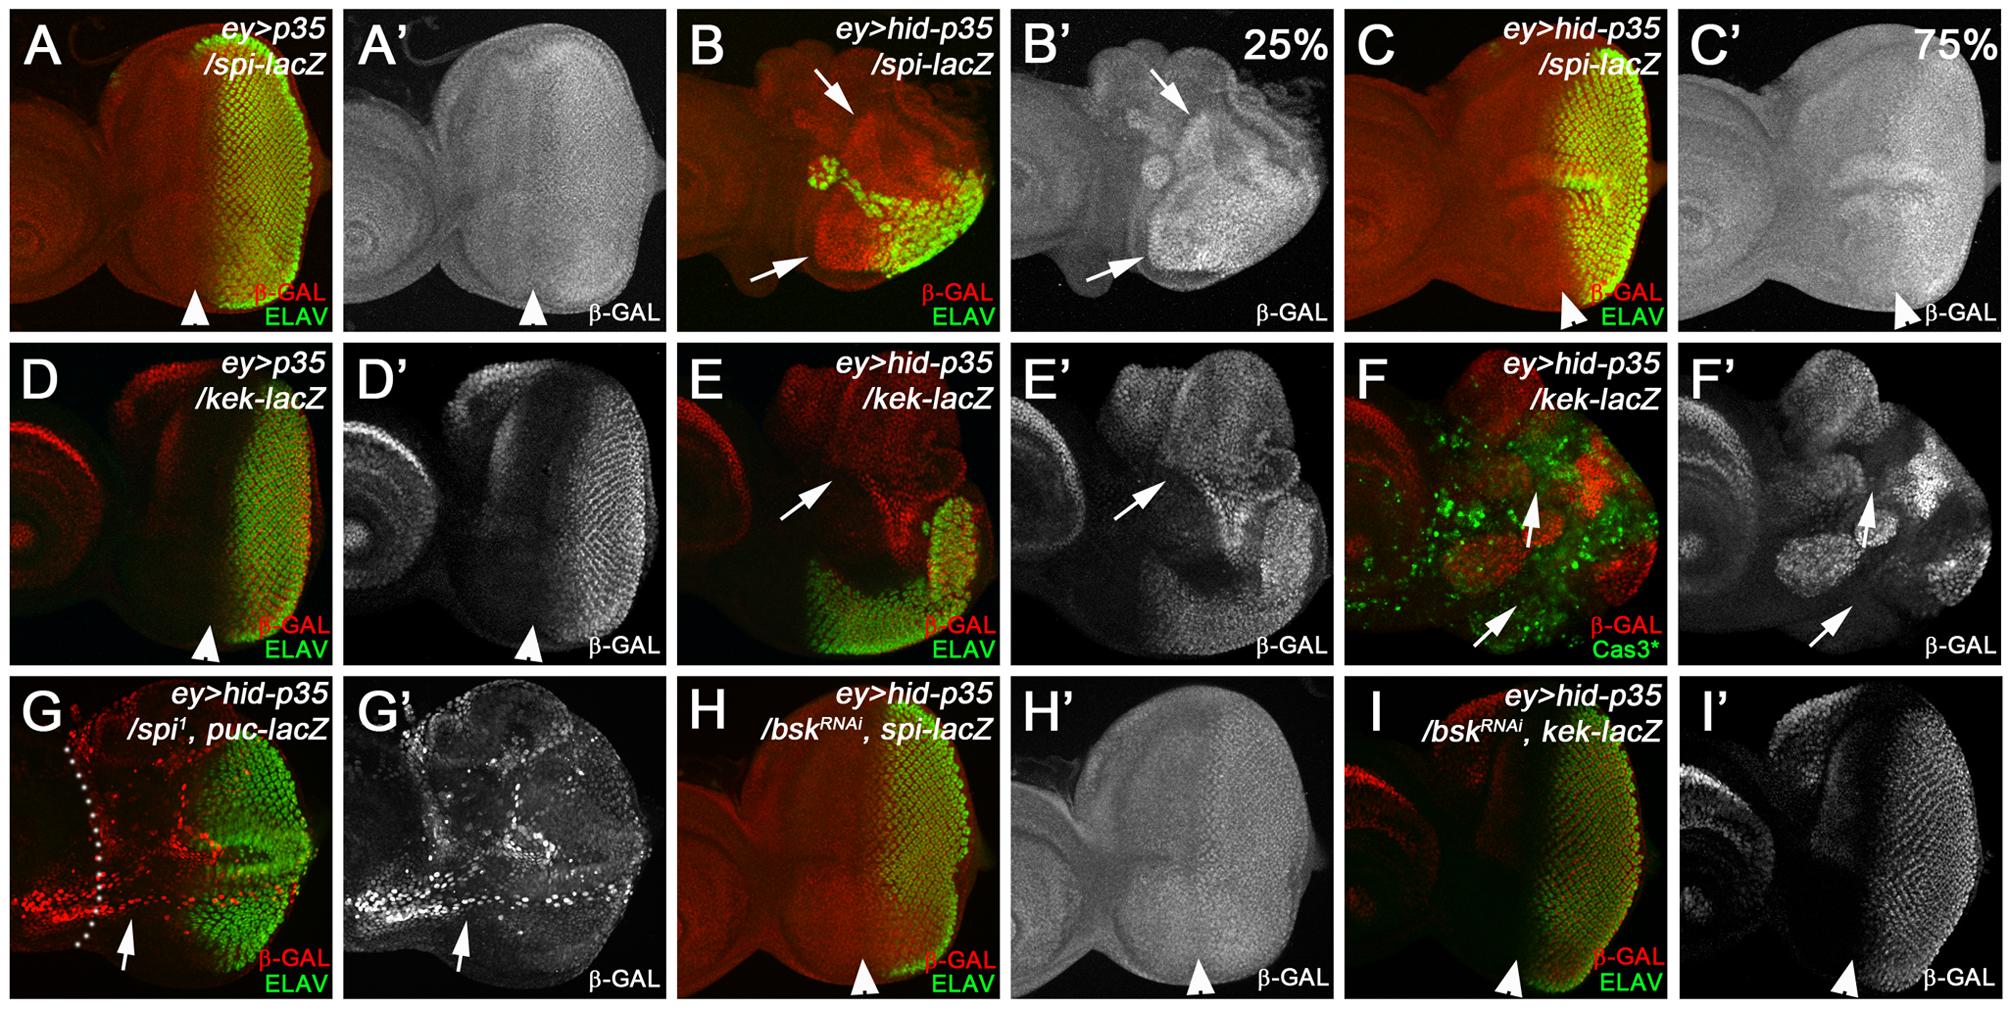 Epistasis analysis of <i>spi</i> and <i>bsk</i>.